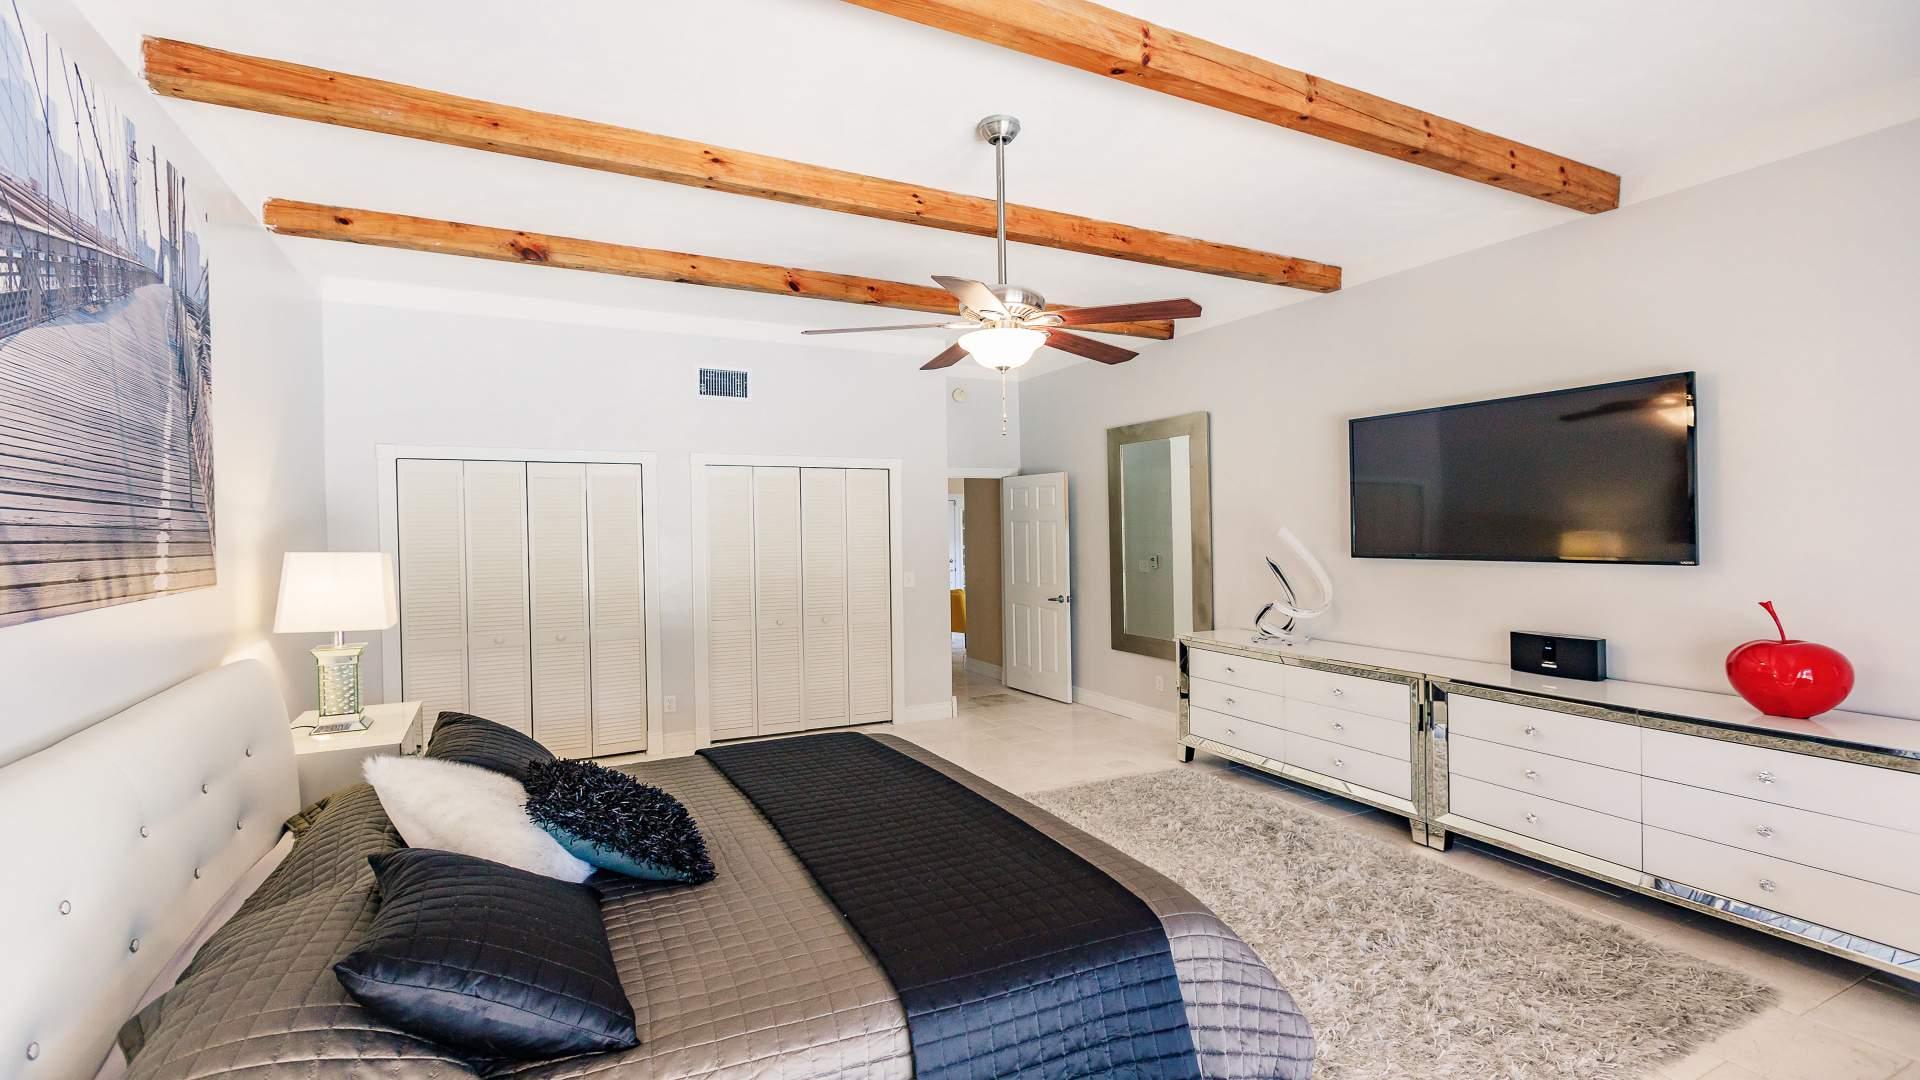 Florida, Cape Coral, Ferienhaus, Arabella Ranch